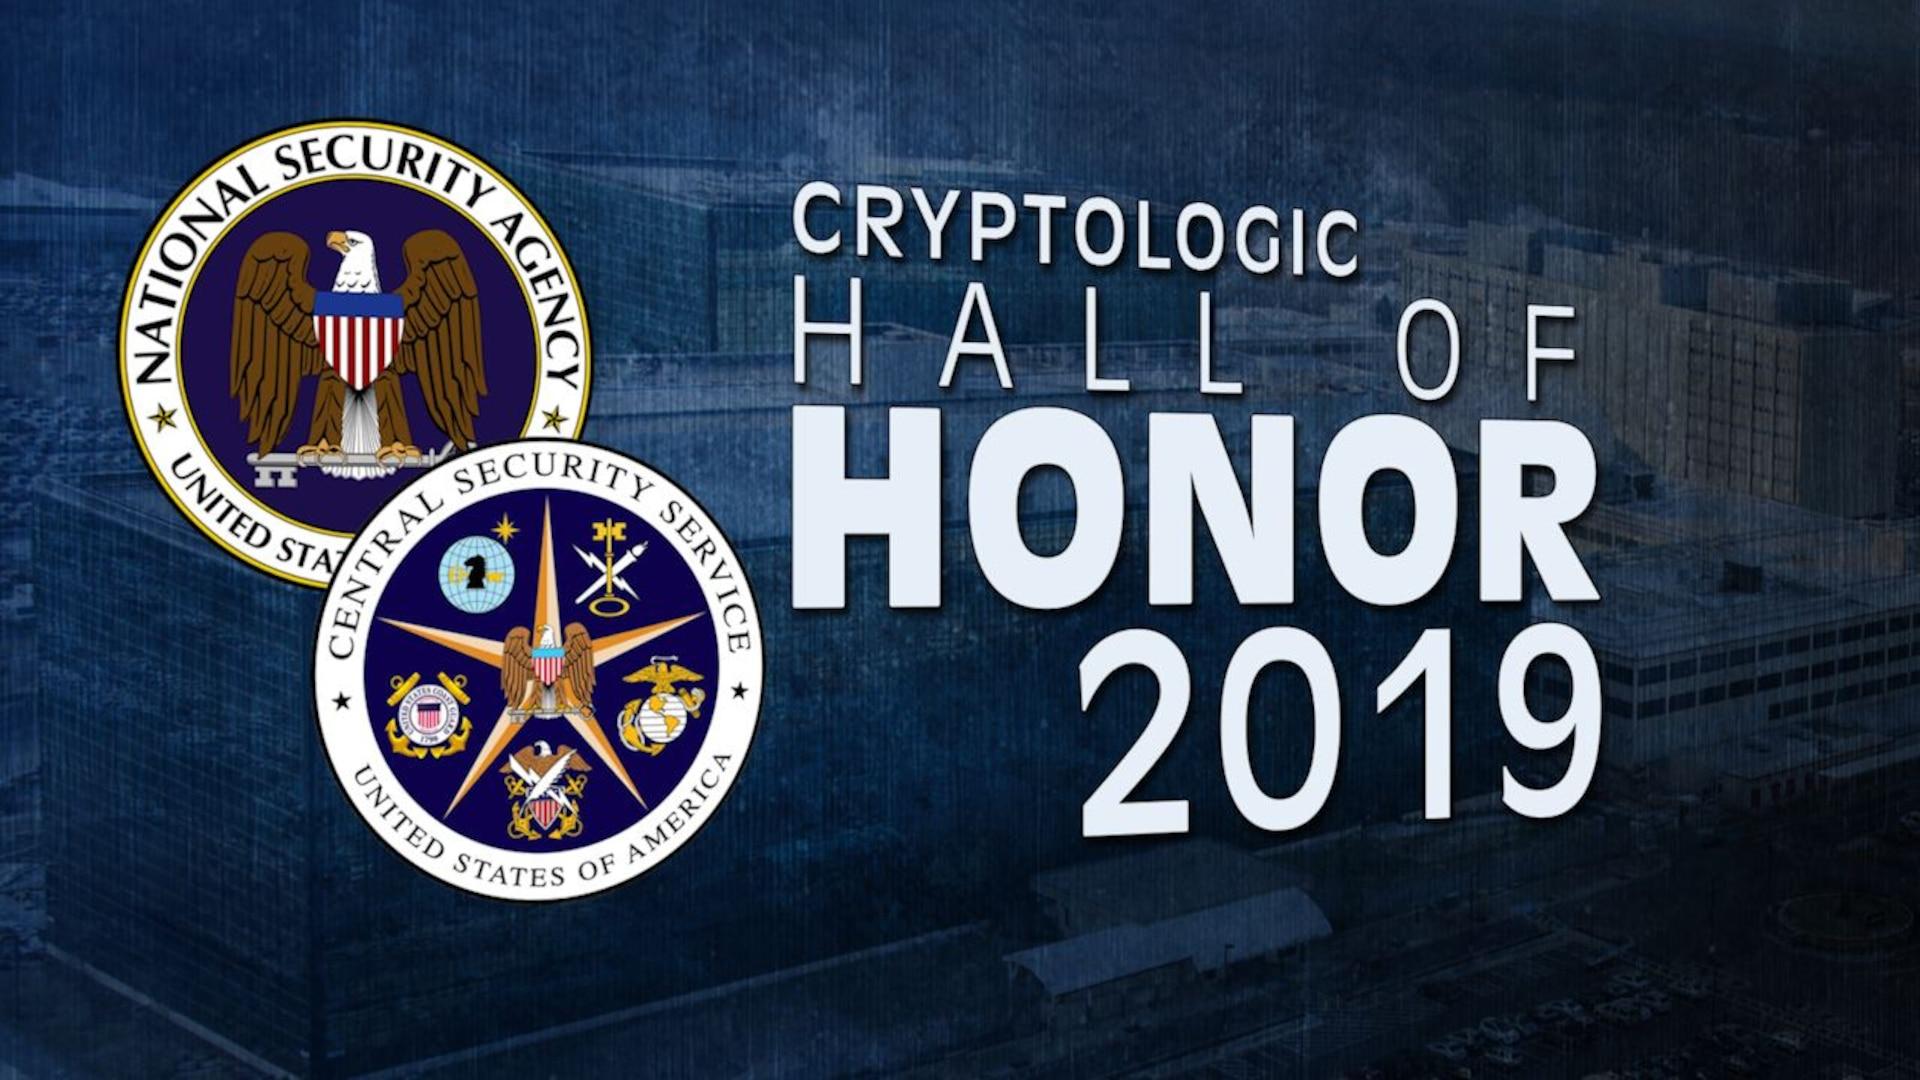 NSA Cryptologic Hall of Honor 2019